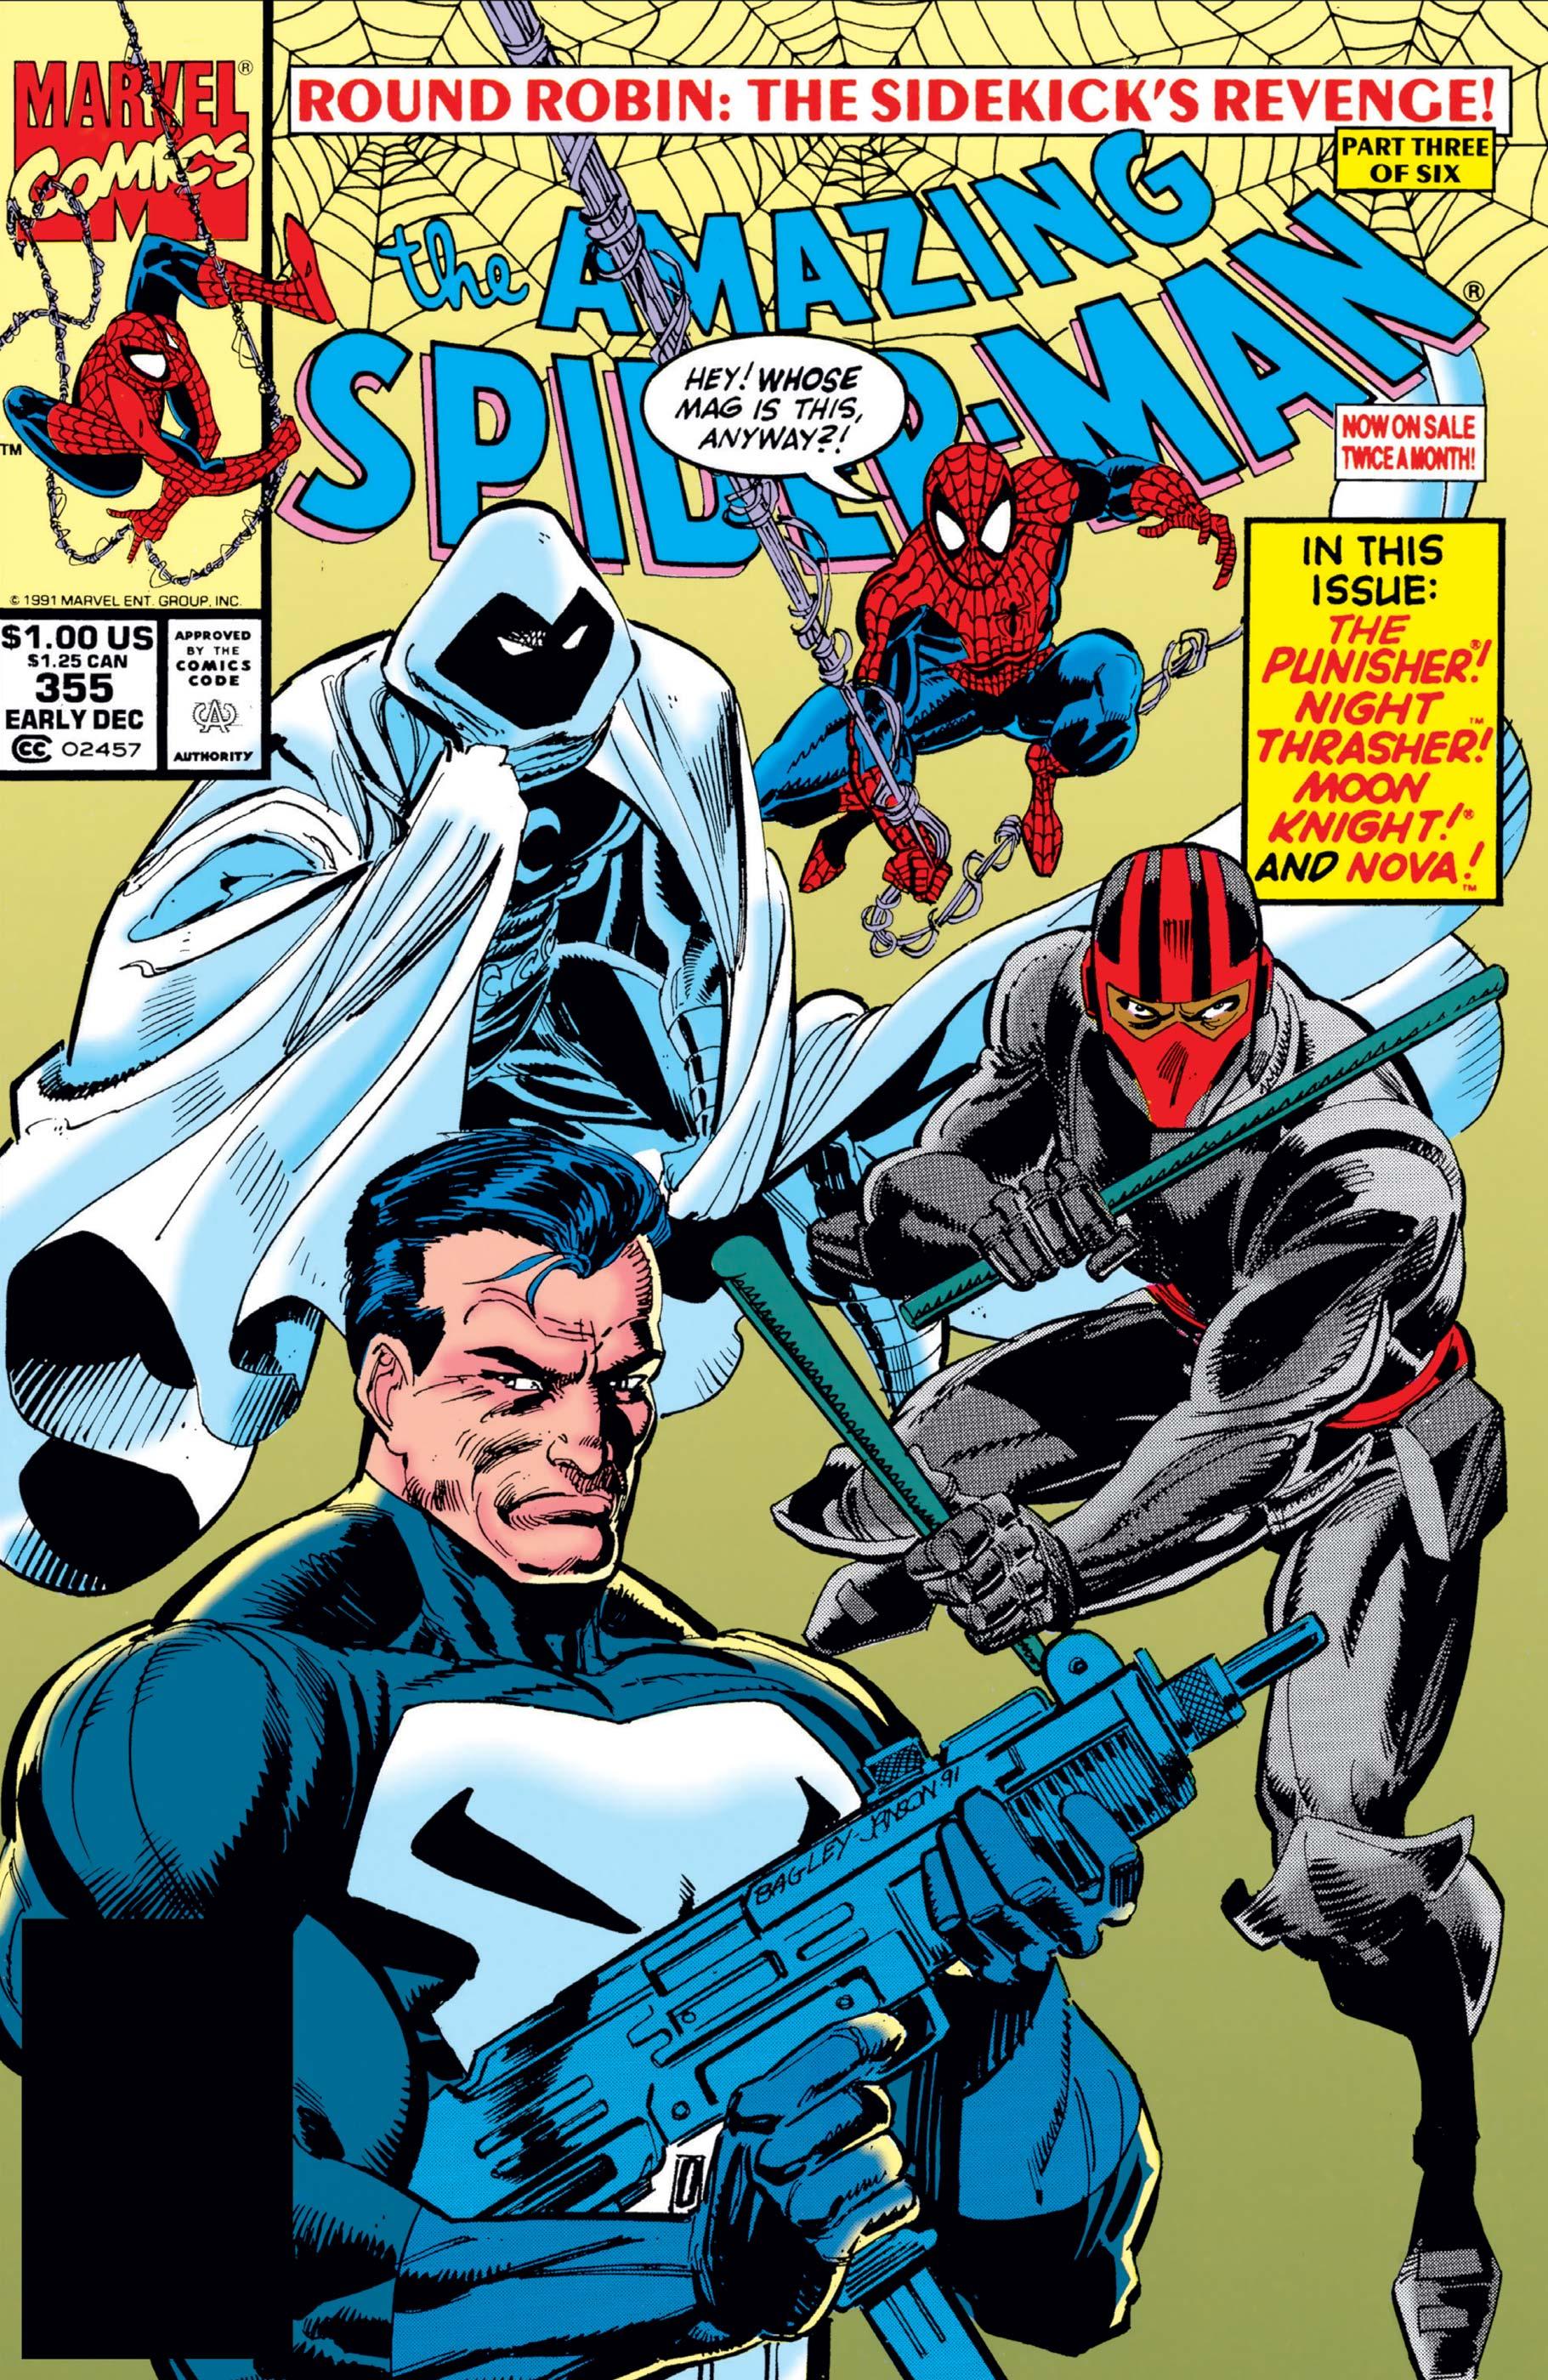 The Amazing Spider-Man (1963) #355